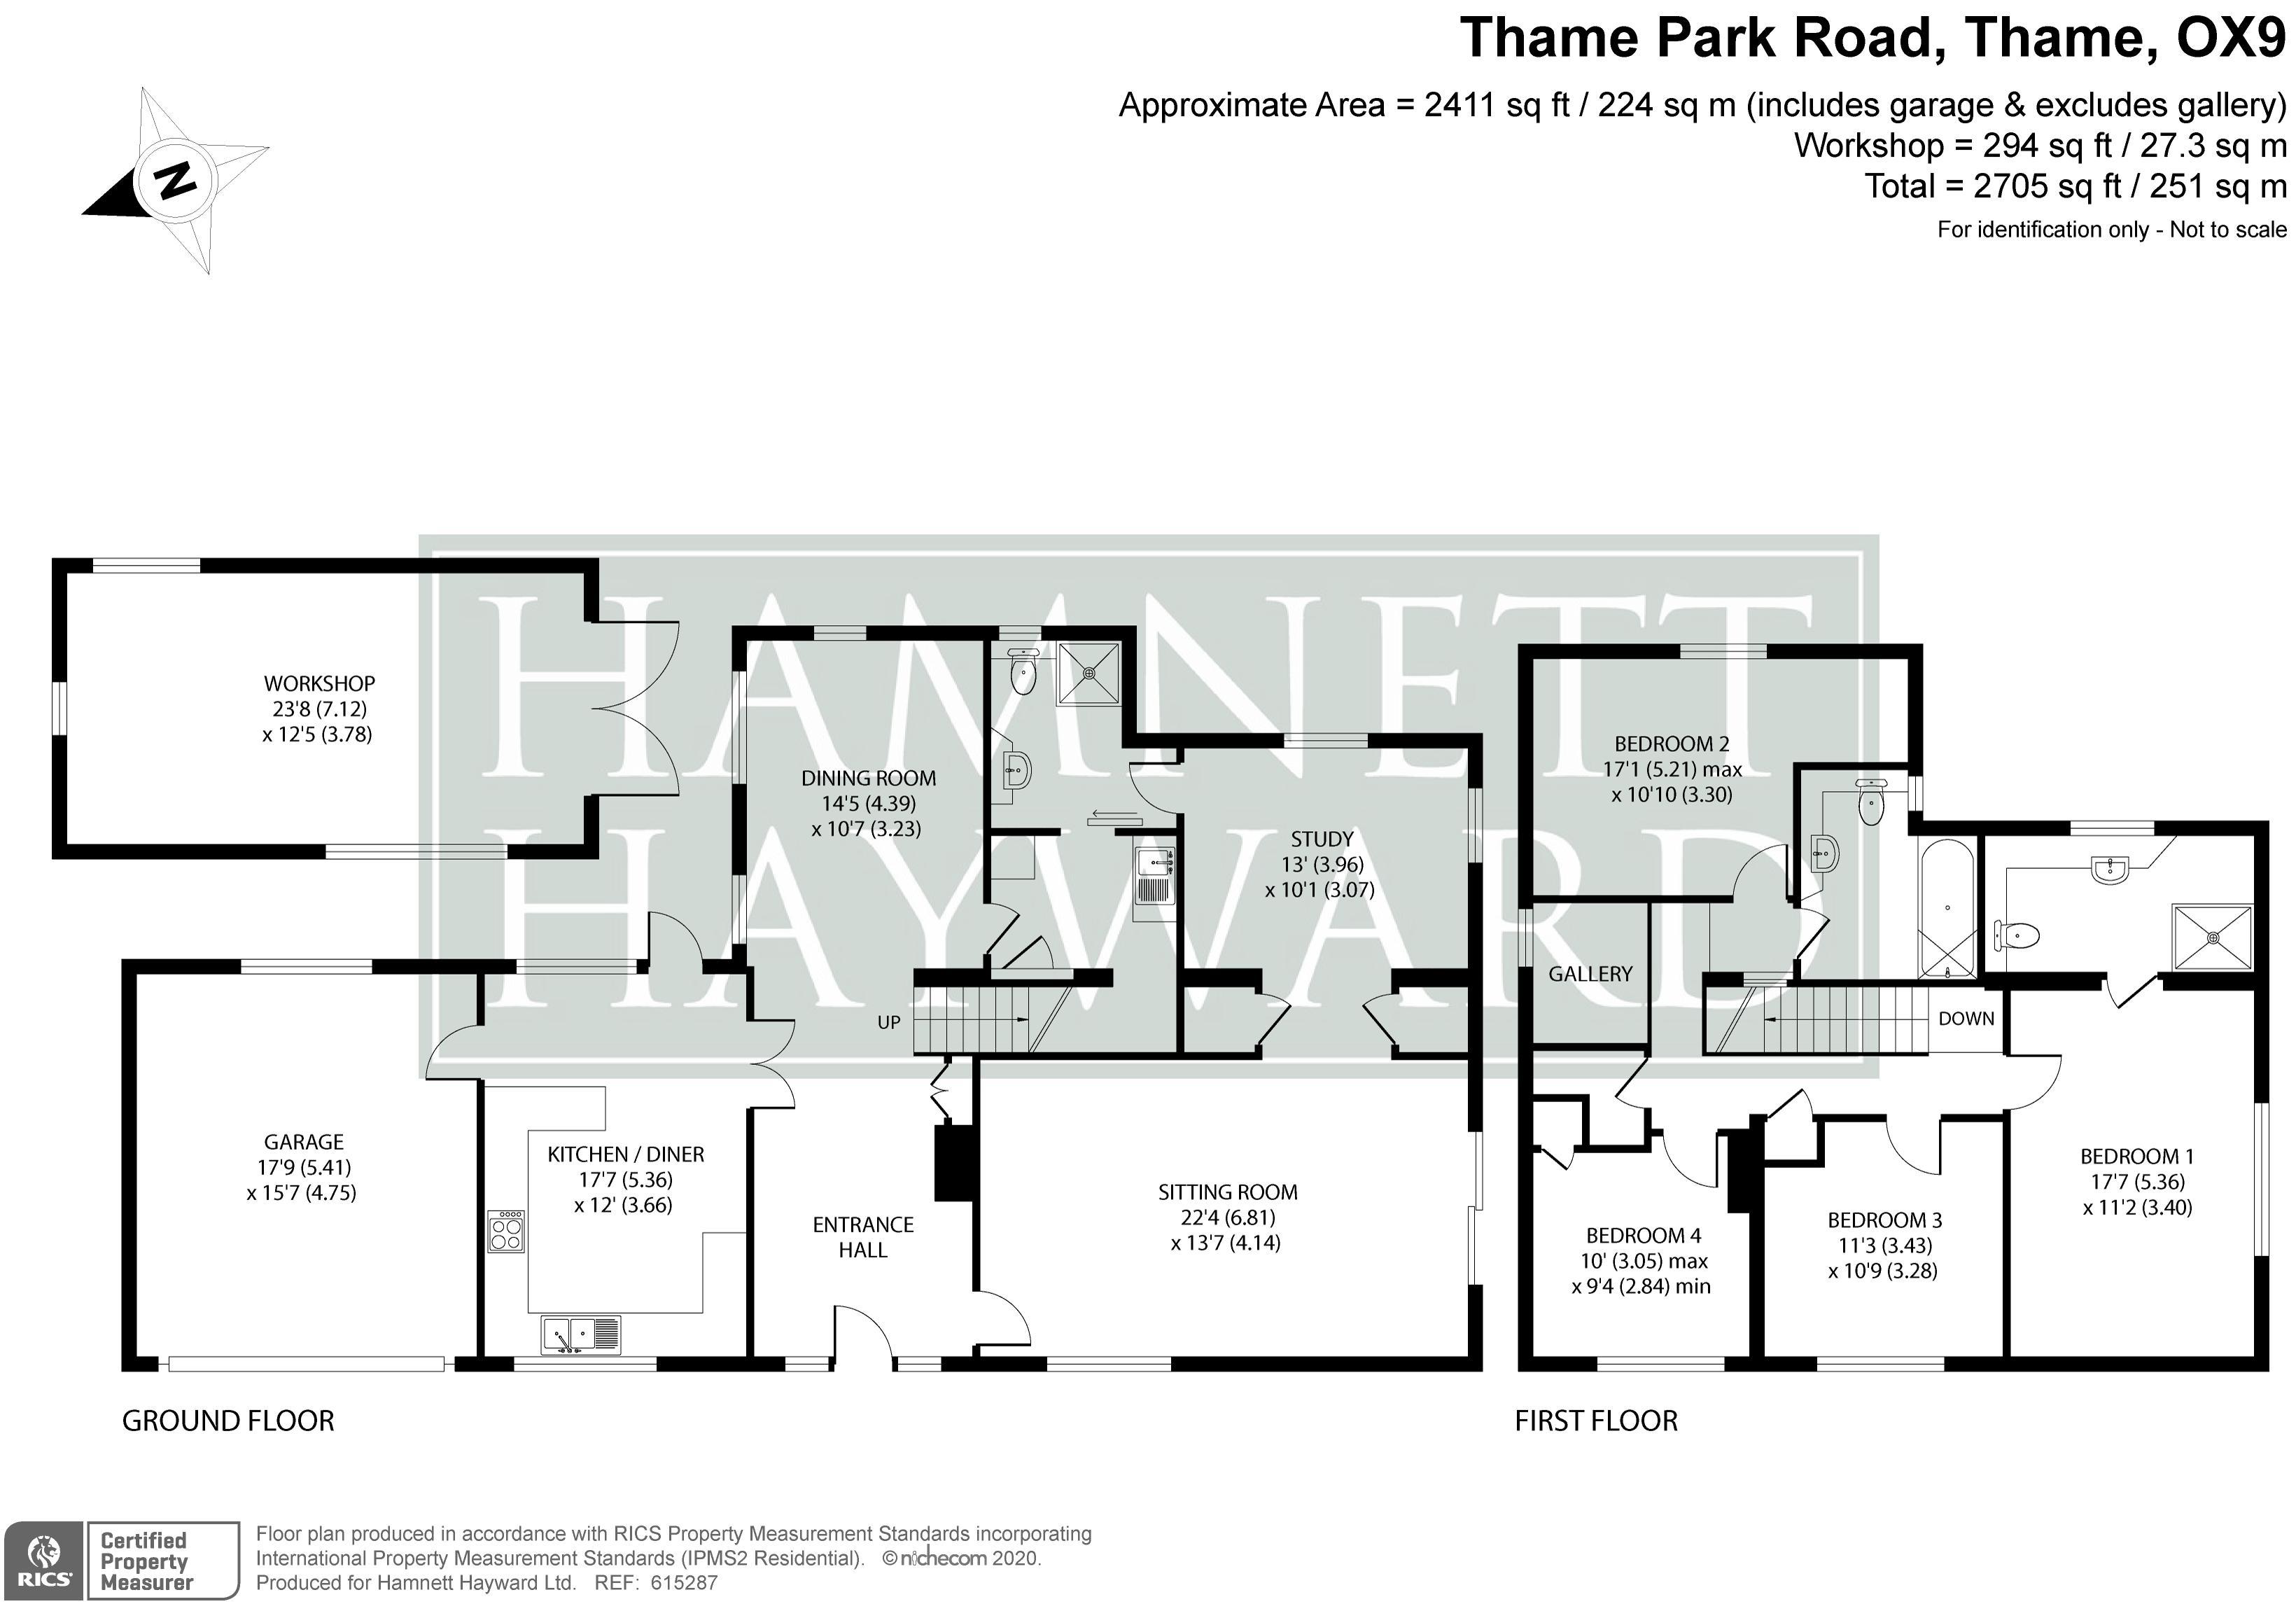 Thame Park Road